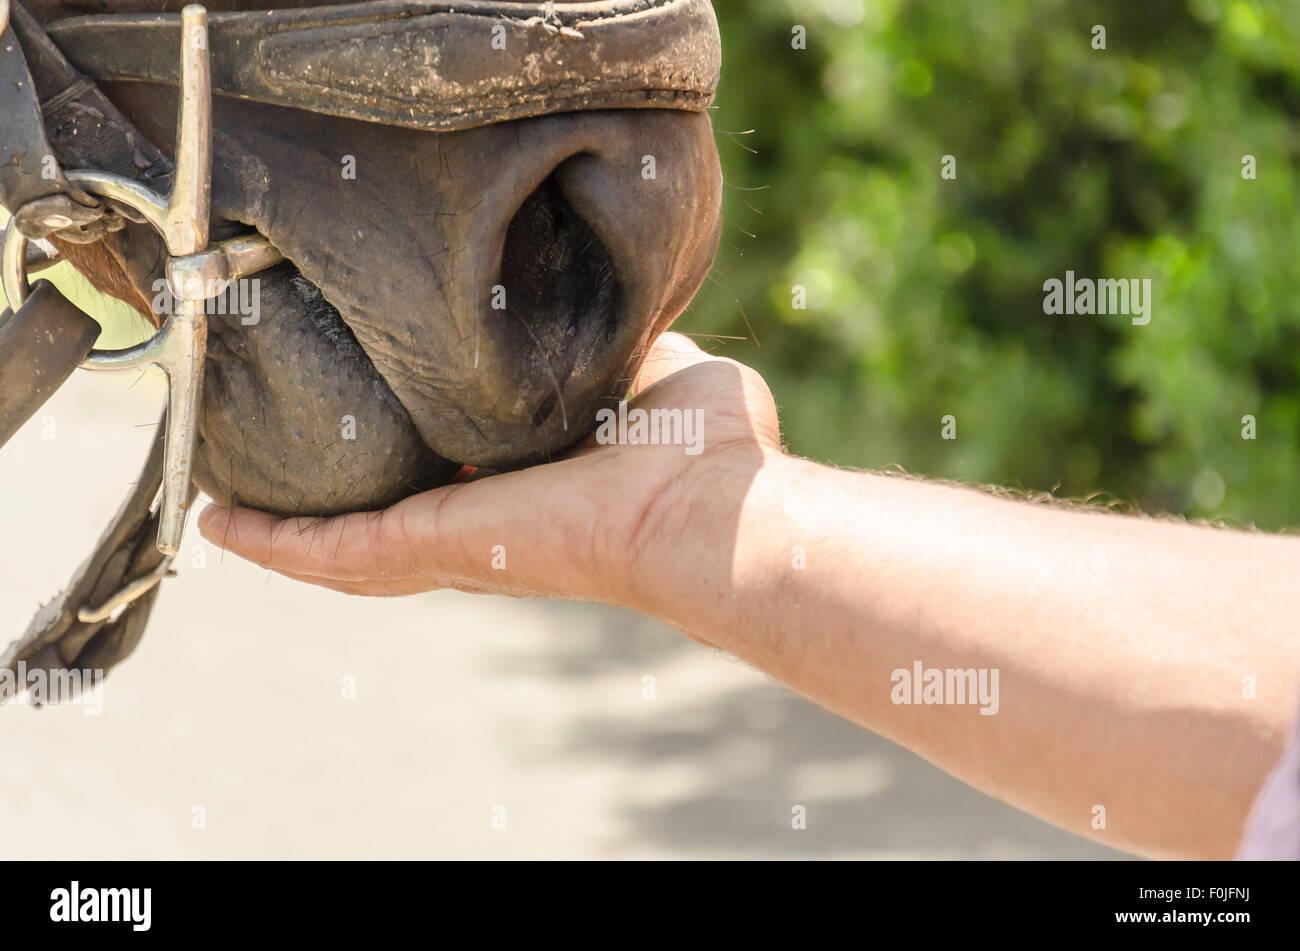 A person feeding a horse - Stock Image